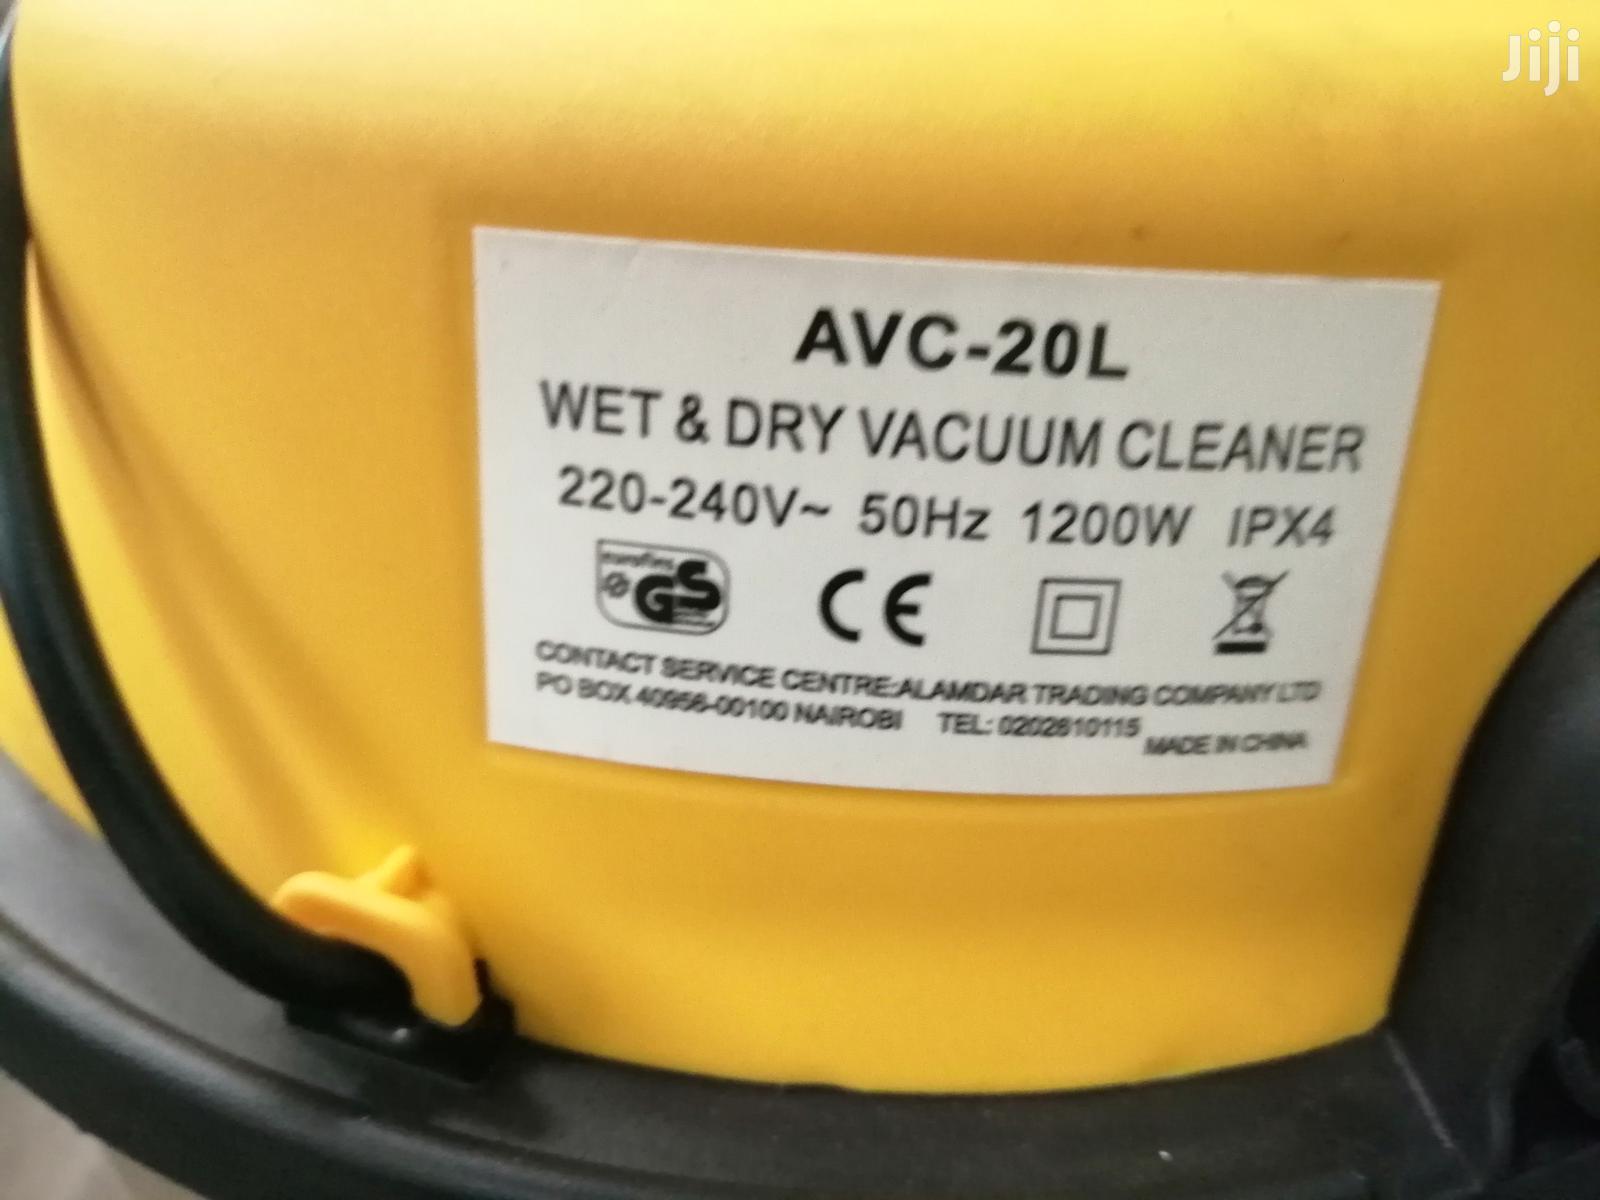 Avc 20l Wet & Dry Vacuum Cleaner | Home Appliances for sale in Imara Daima, Nairobi, Kenya